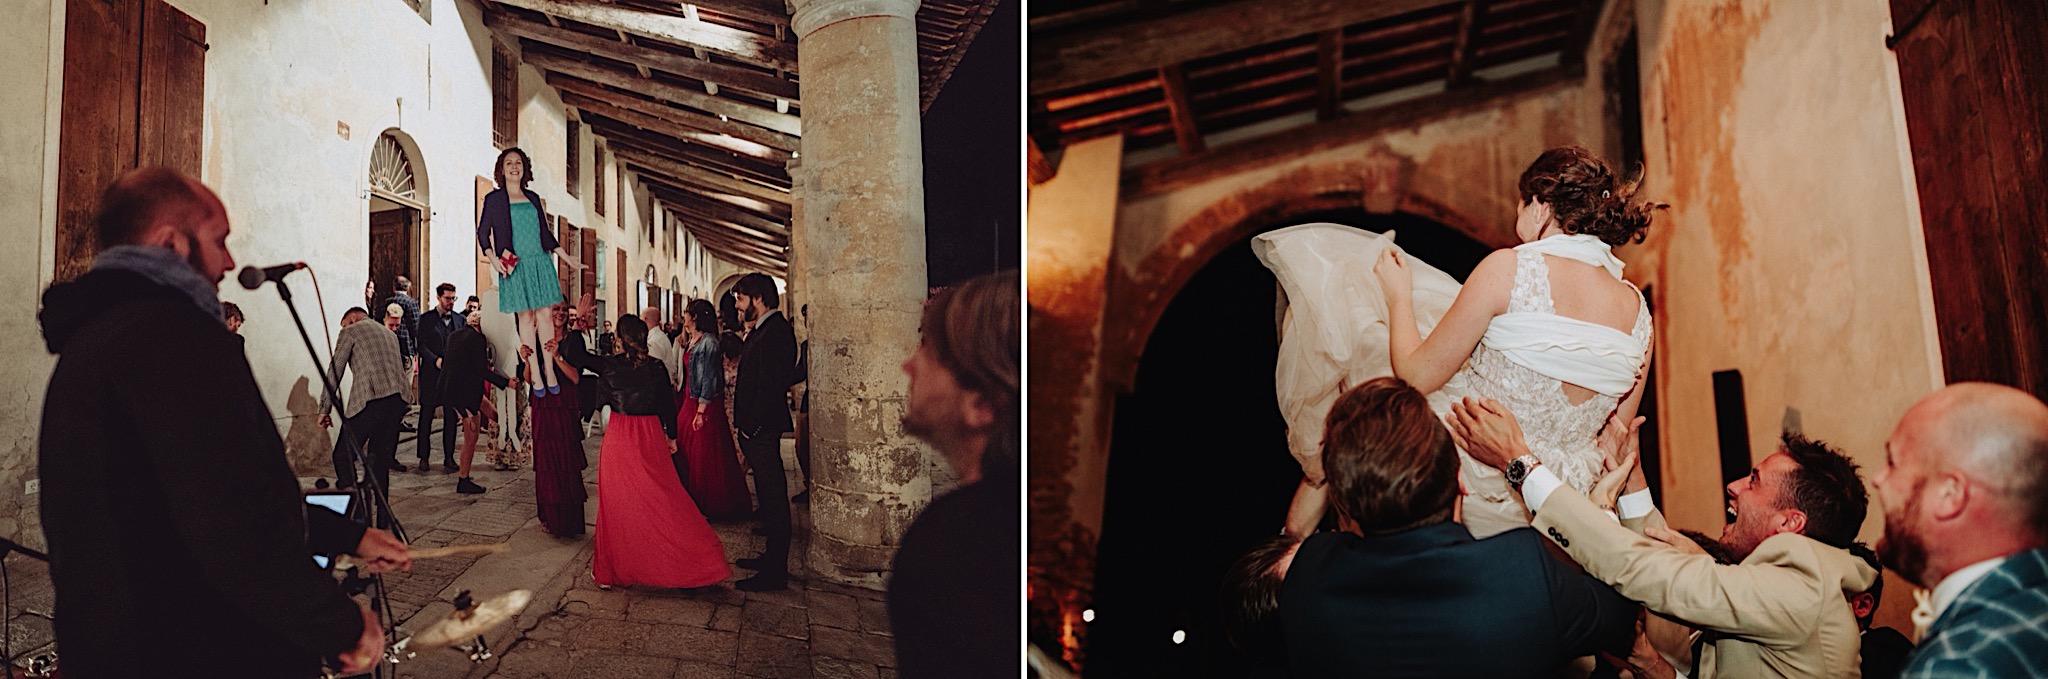 fotografo-matrimonio-villa-papafava-frassanelle-62